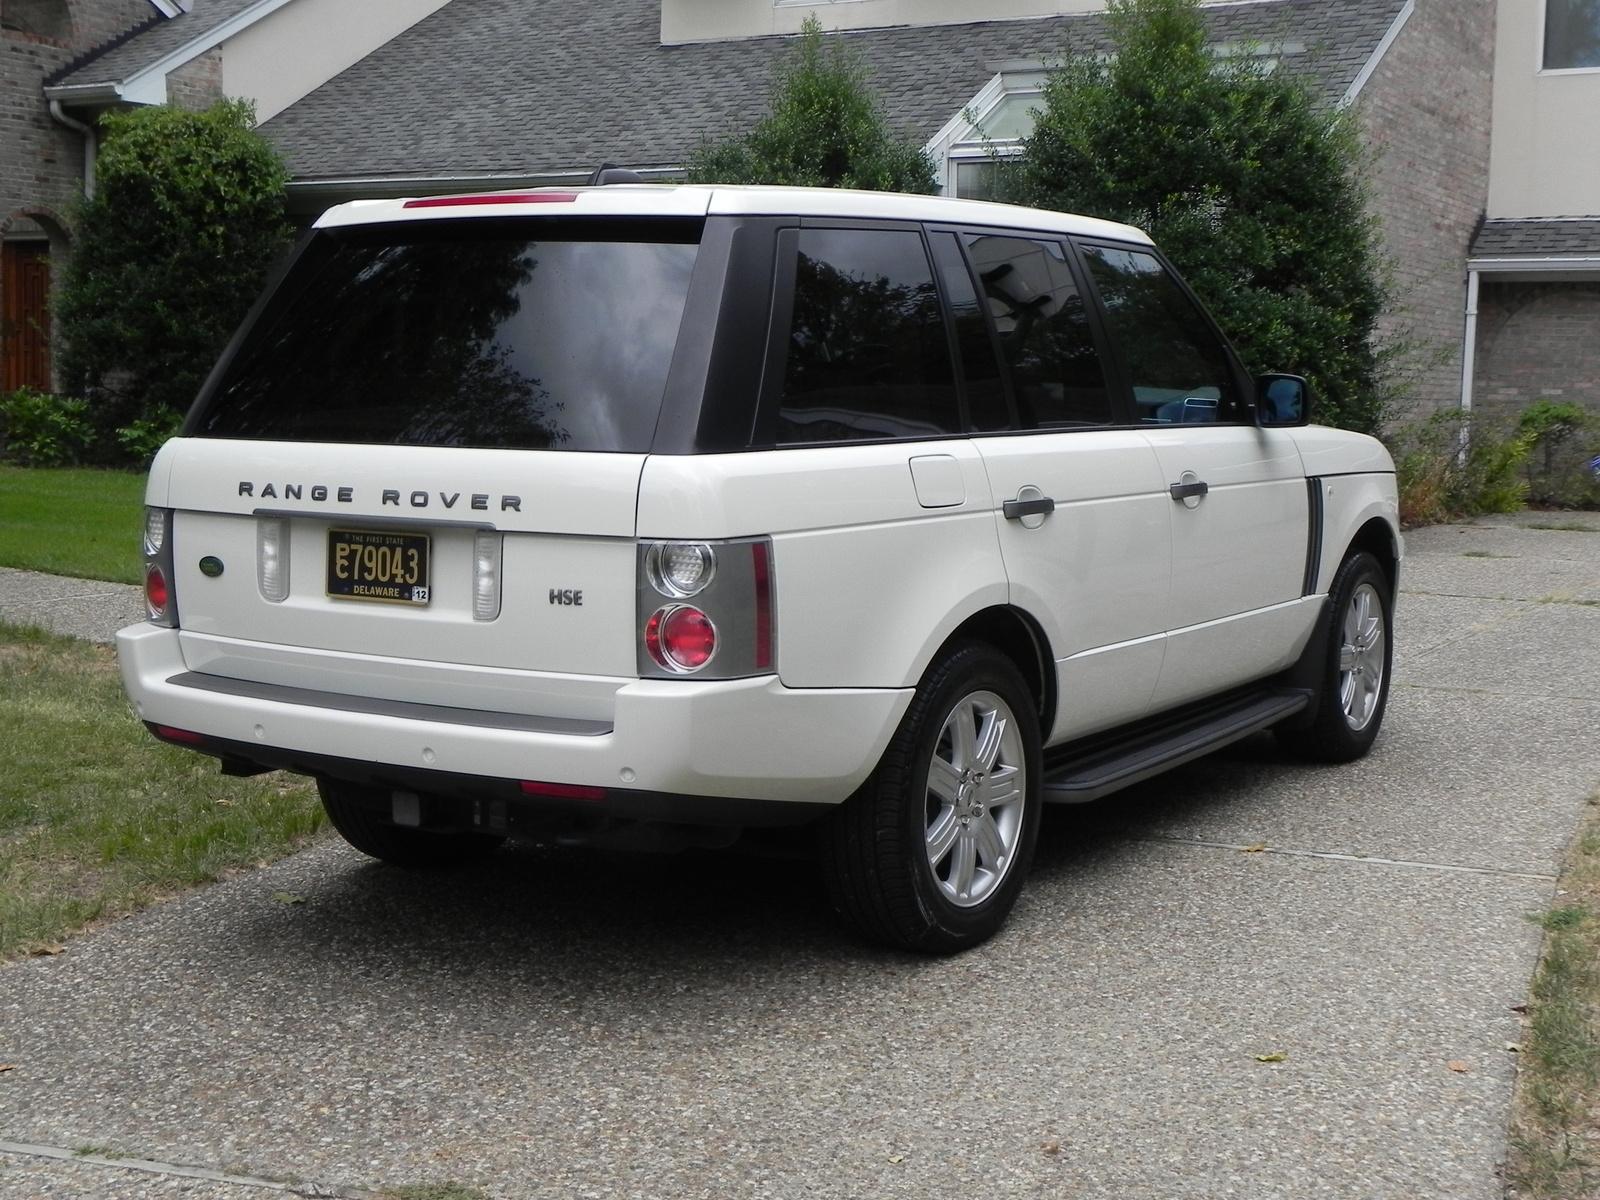 2008 Land Rover Range Rover Pictures Cargurus